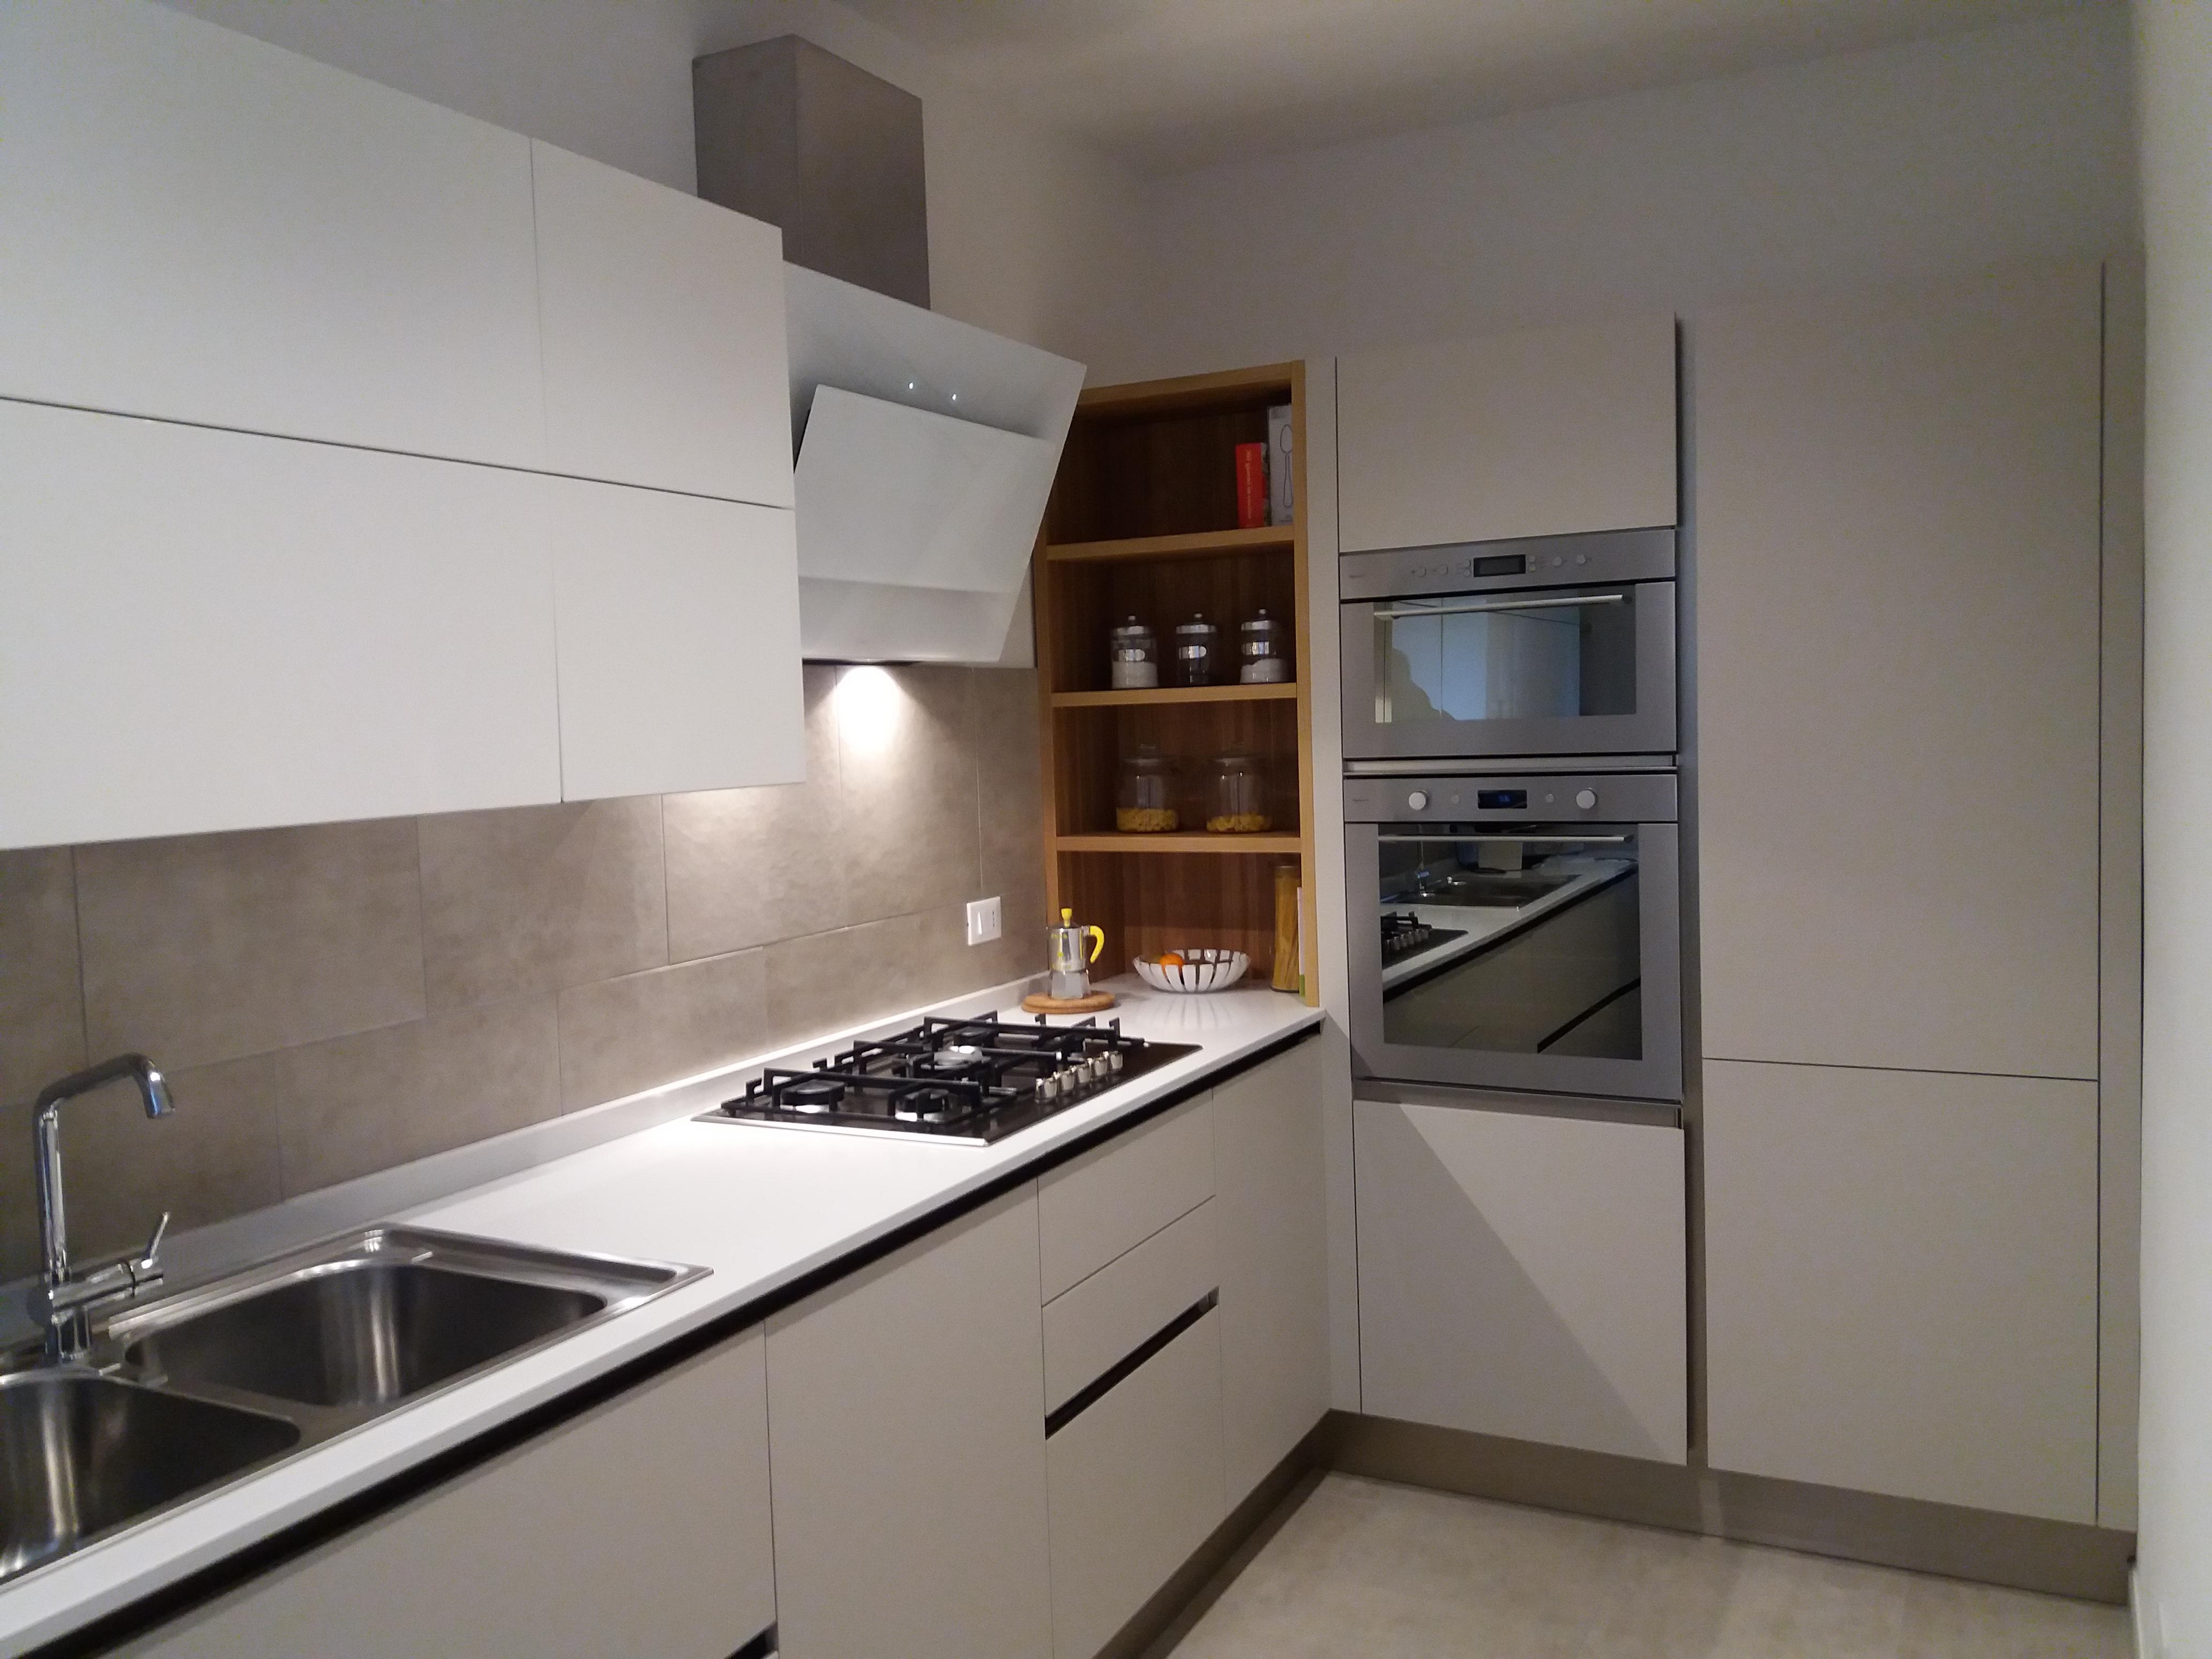 Cucina -OYSTER DEK SILK- Veneta Cucine - Minelle Arredamenti